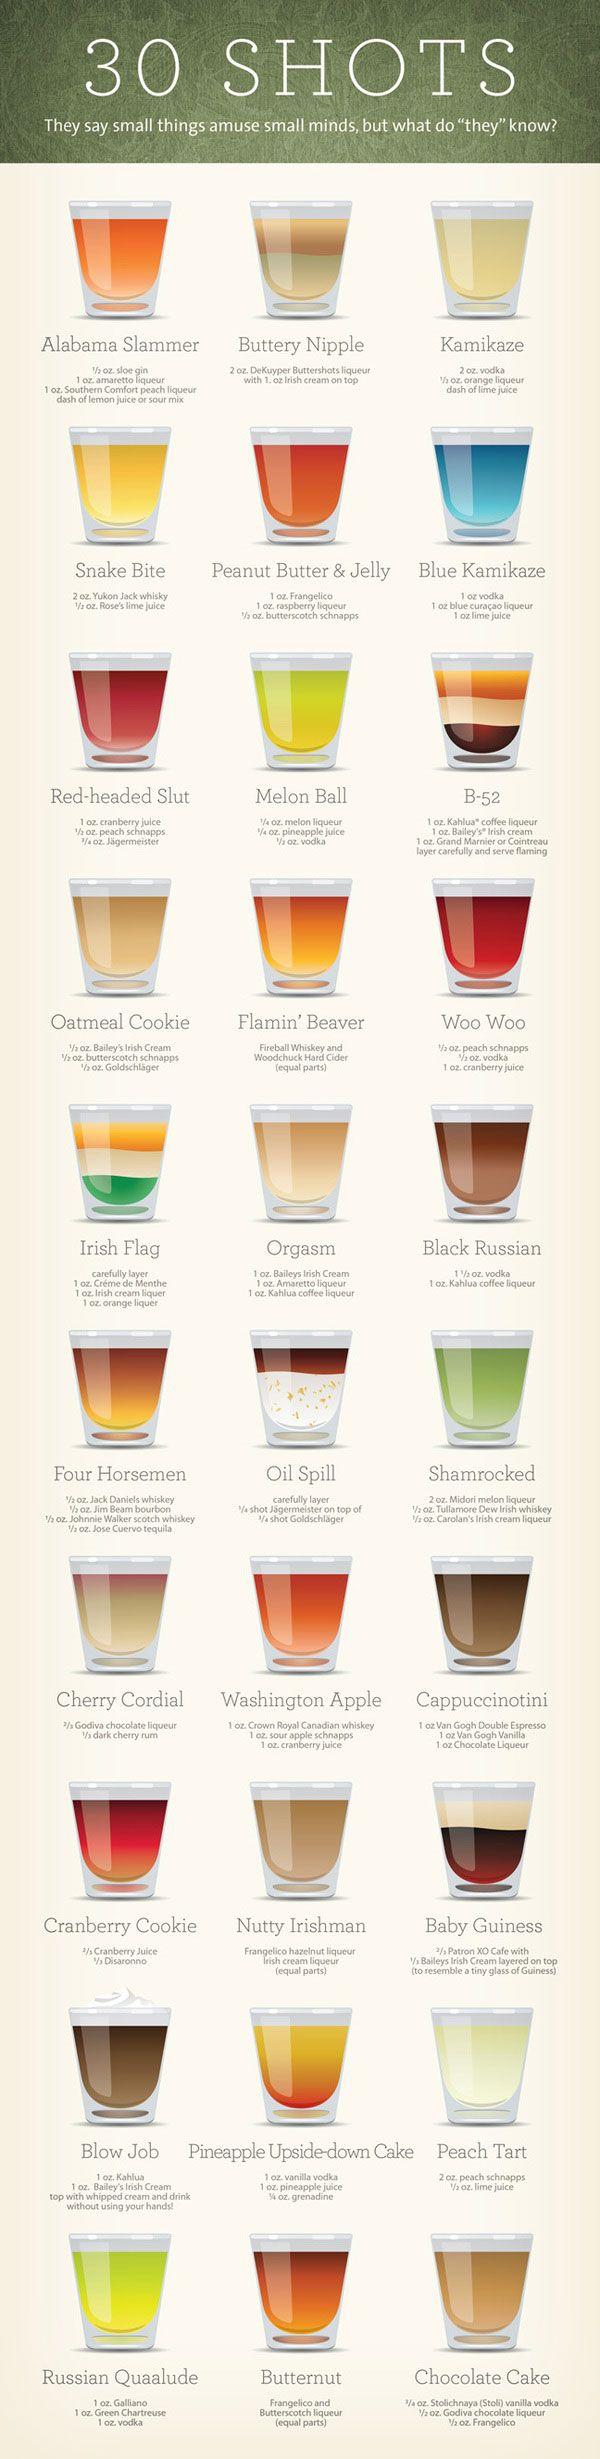 30 shots -- 30 alcohol beverage recipe